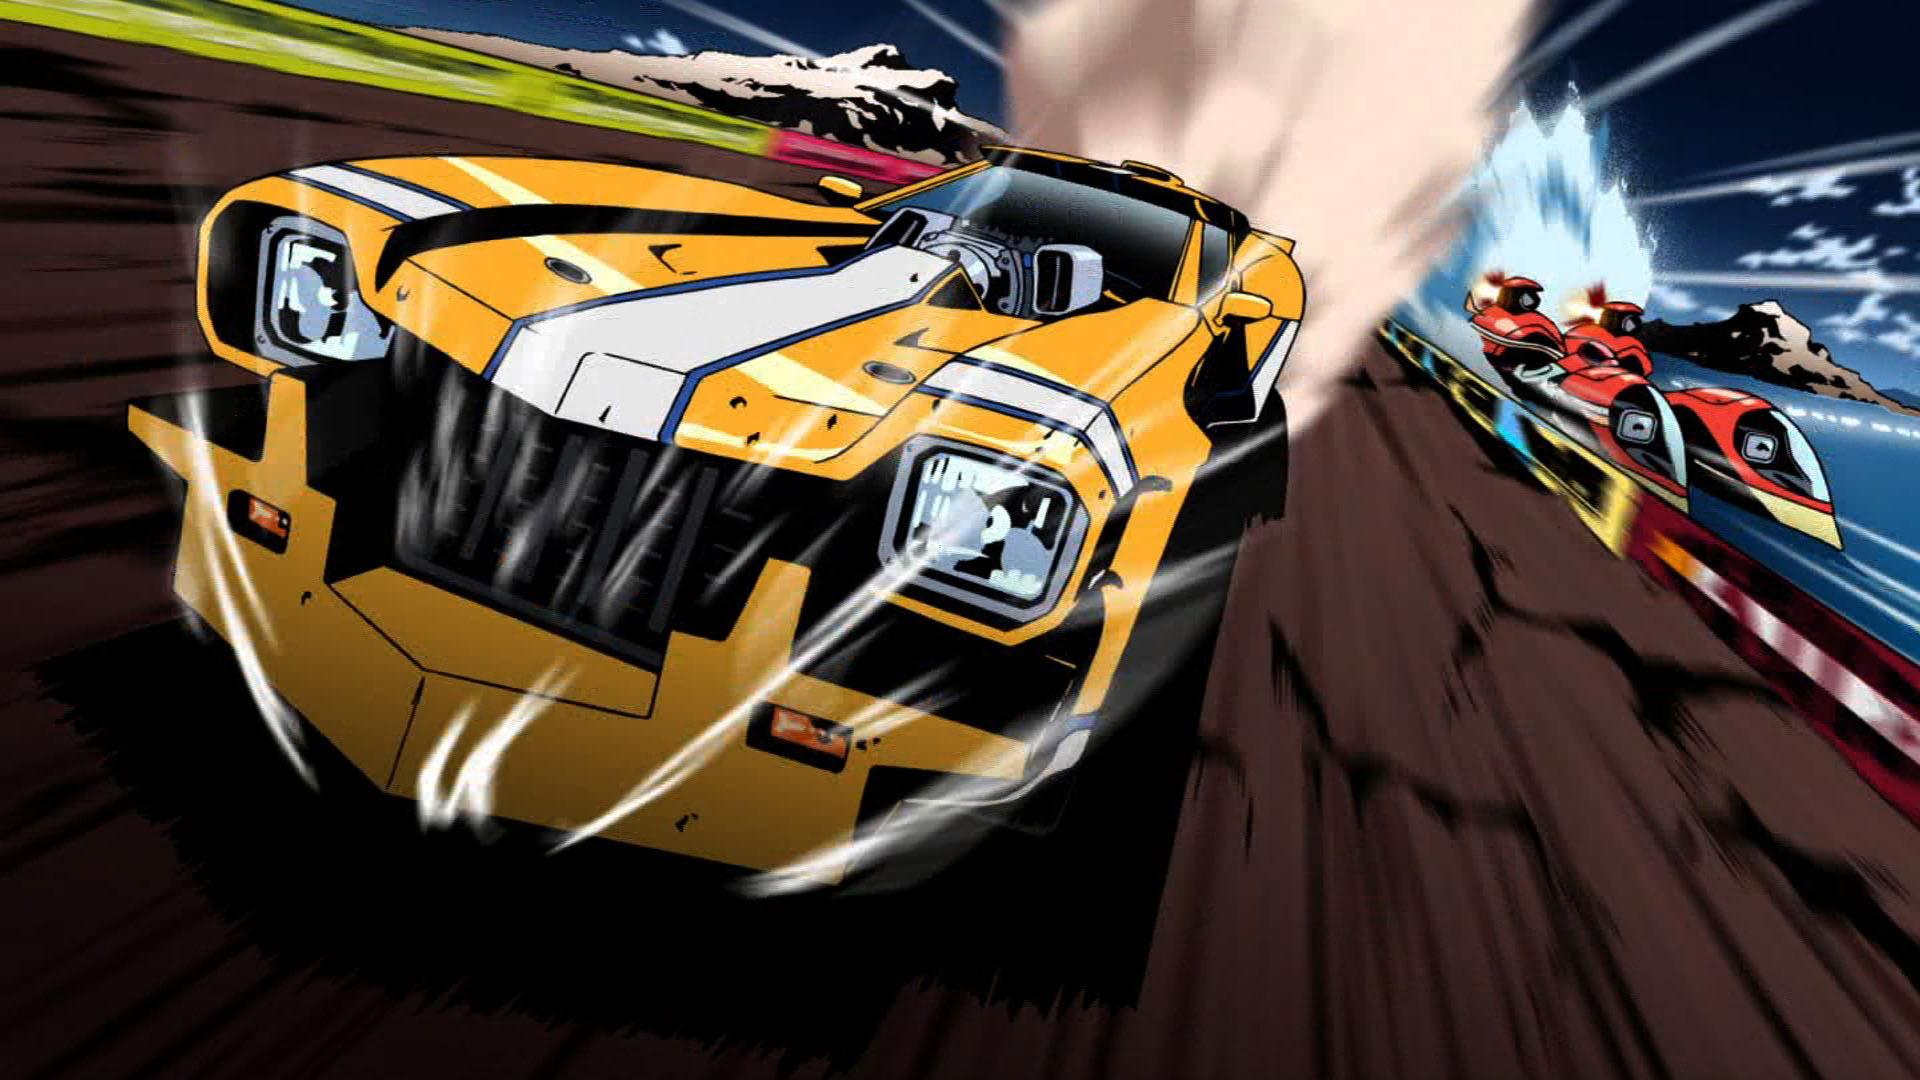 Wangan Midnight - Japanese Street Racing Film (HD) : cars